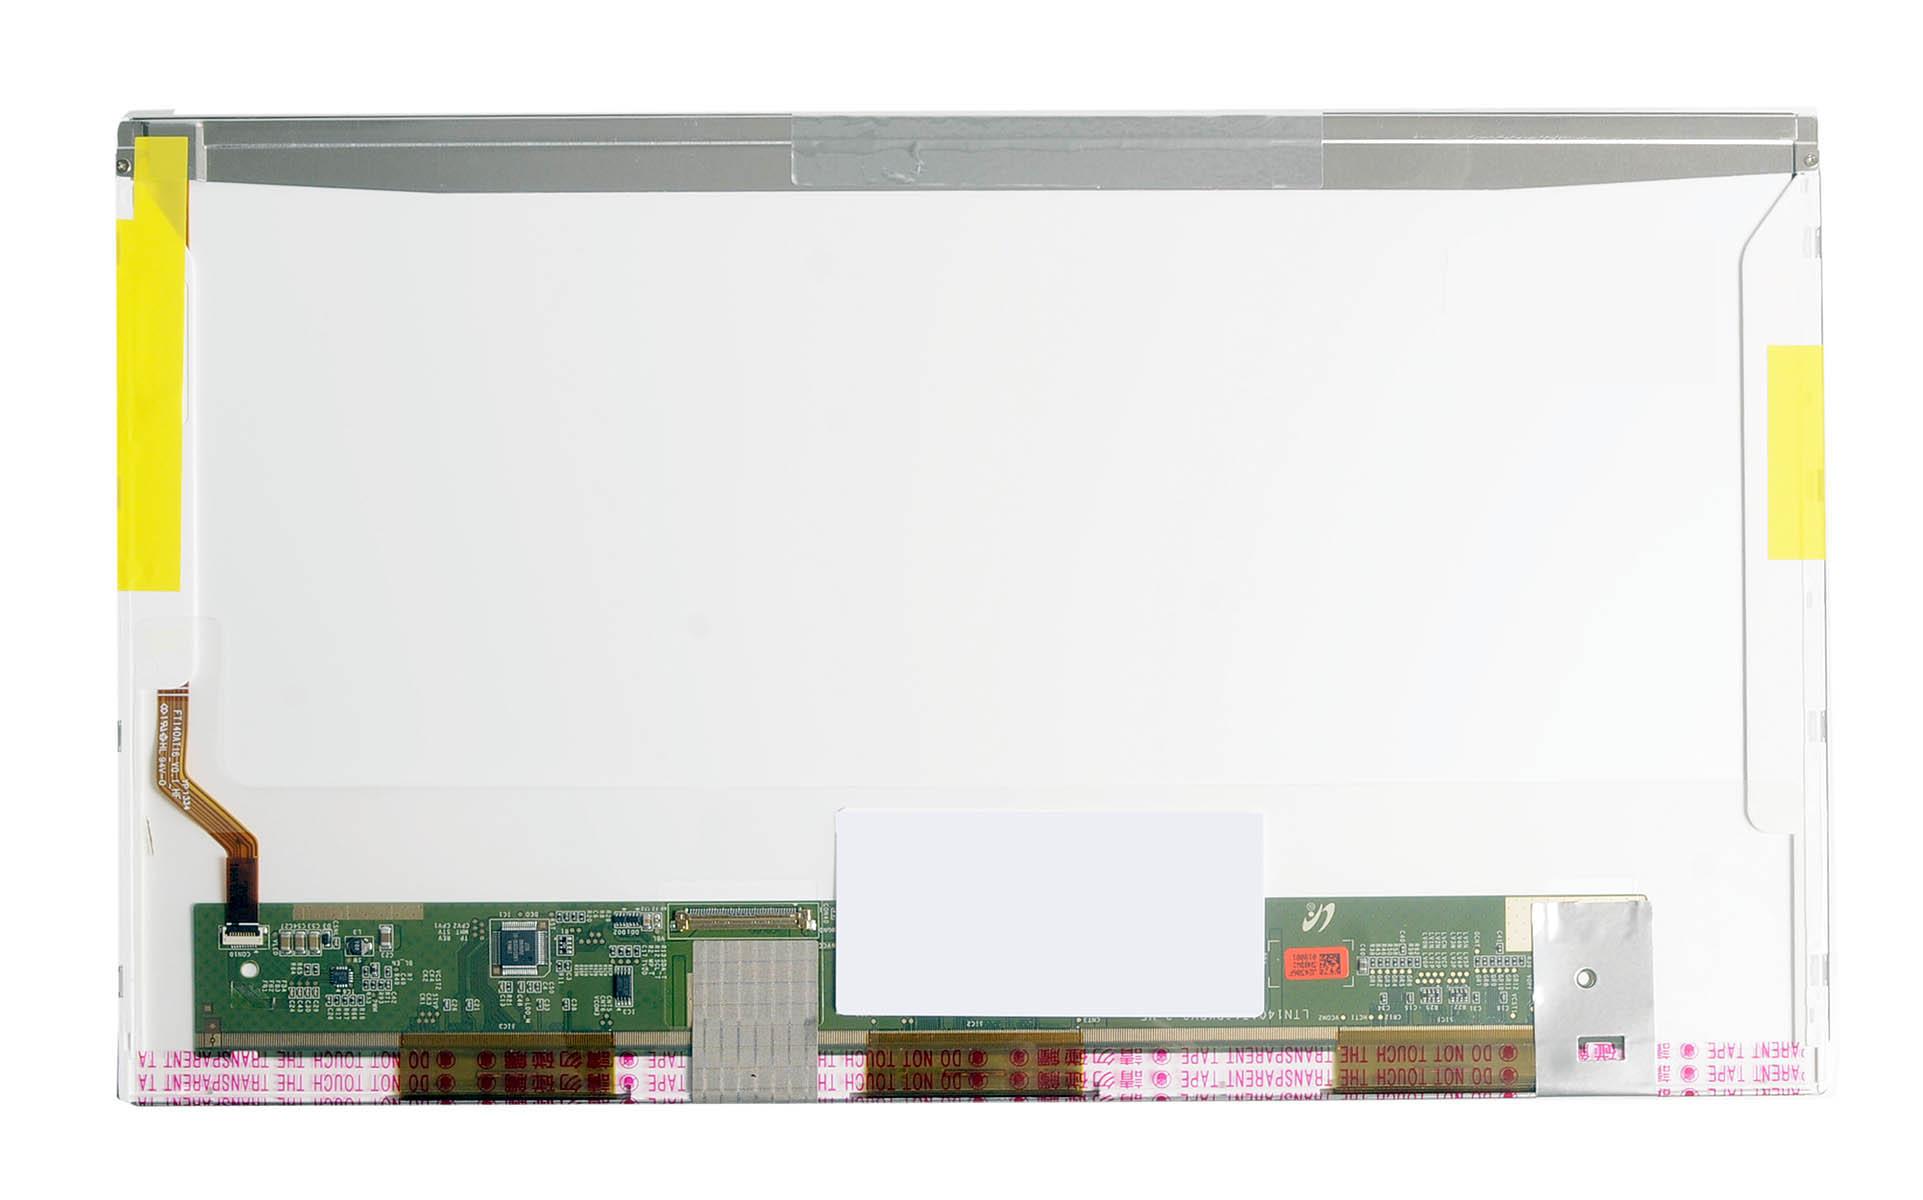 ppt 背景 背景图片 边框 模板 设计 相框 1923_1200